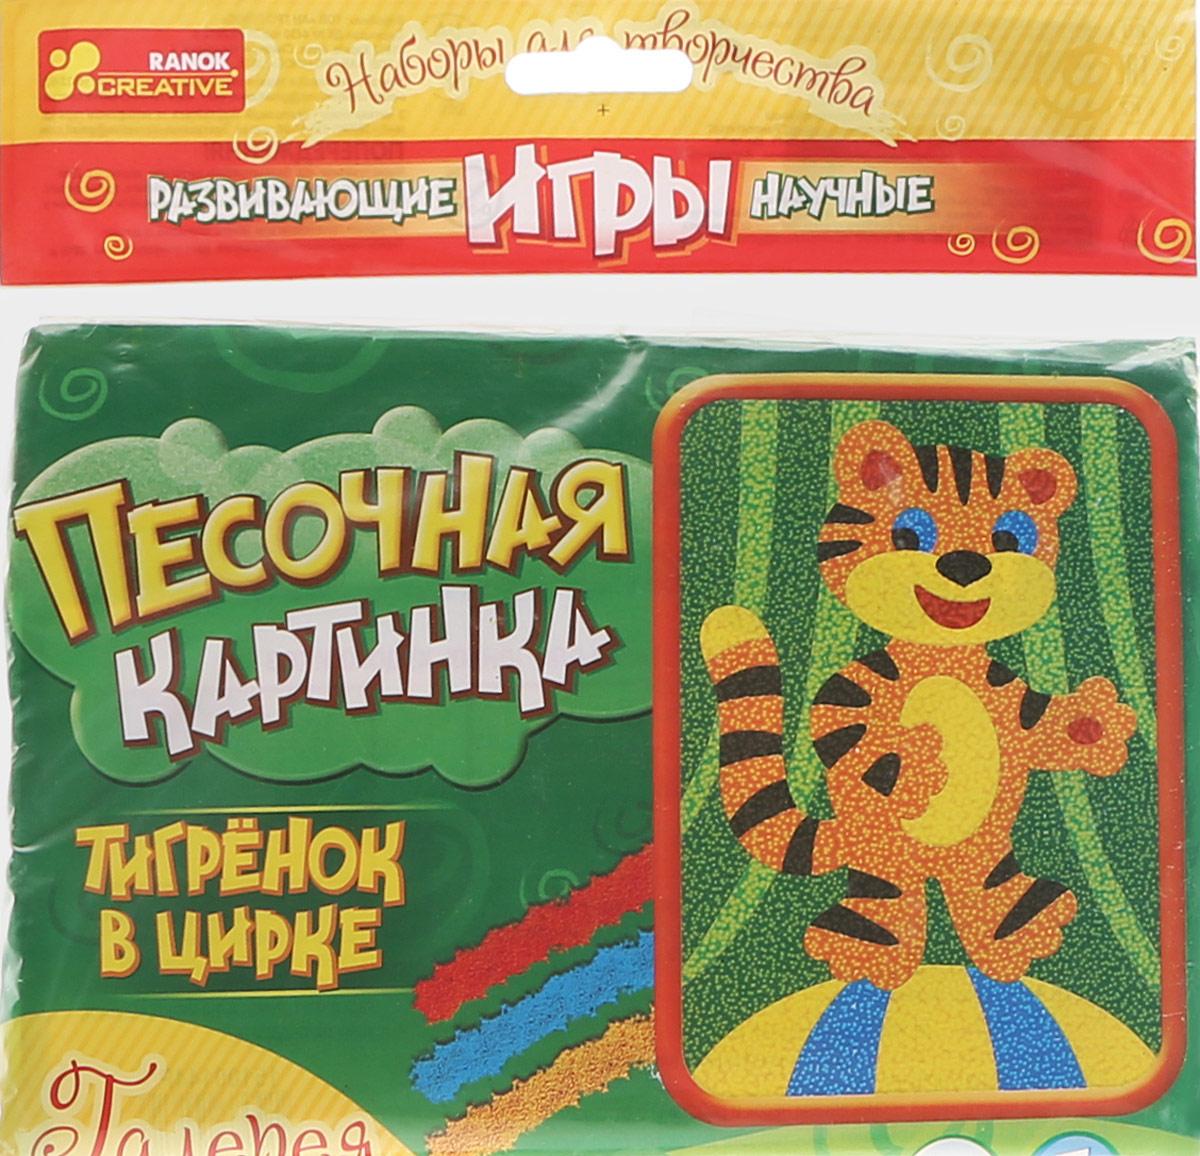 Ranok Набор для творчества Песочная картинка Тигренок в цирке цена